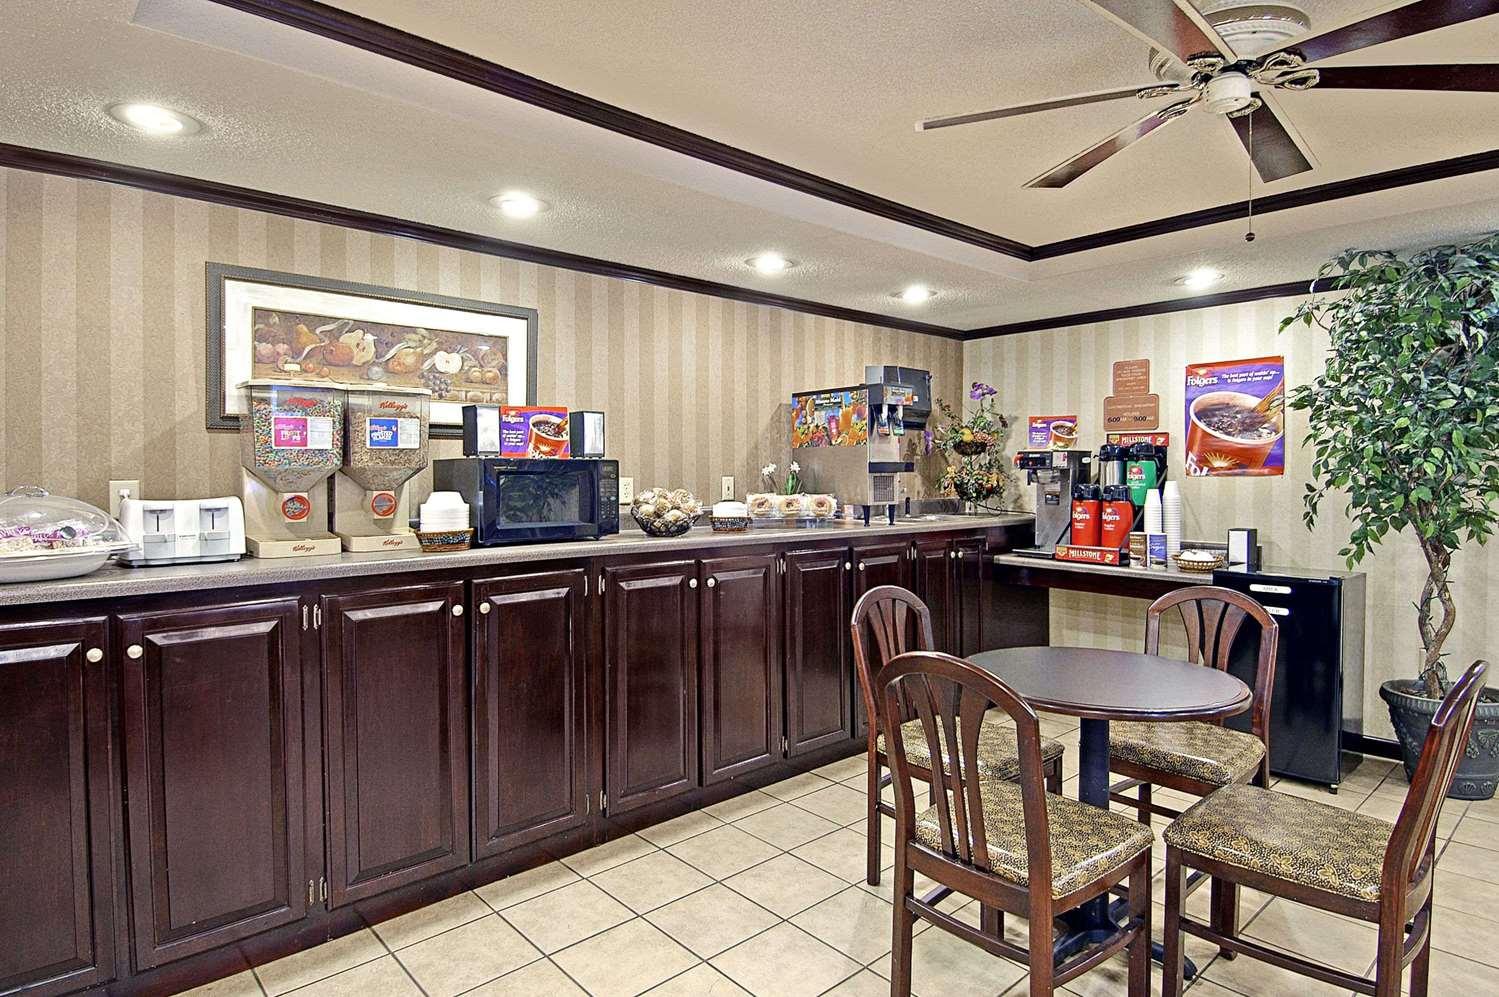 proam - Days Inn & Suites Fort Valley